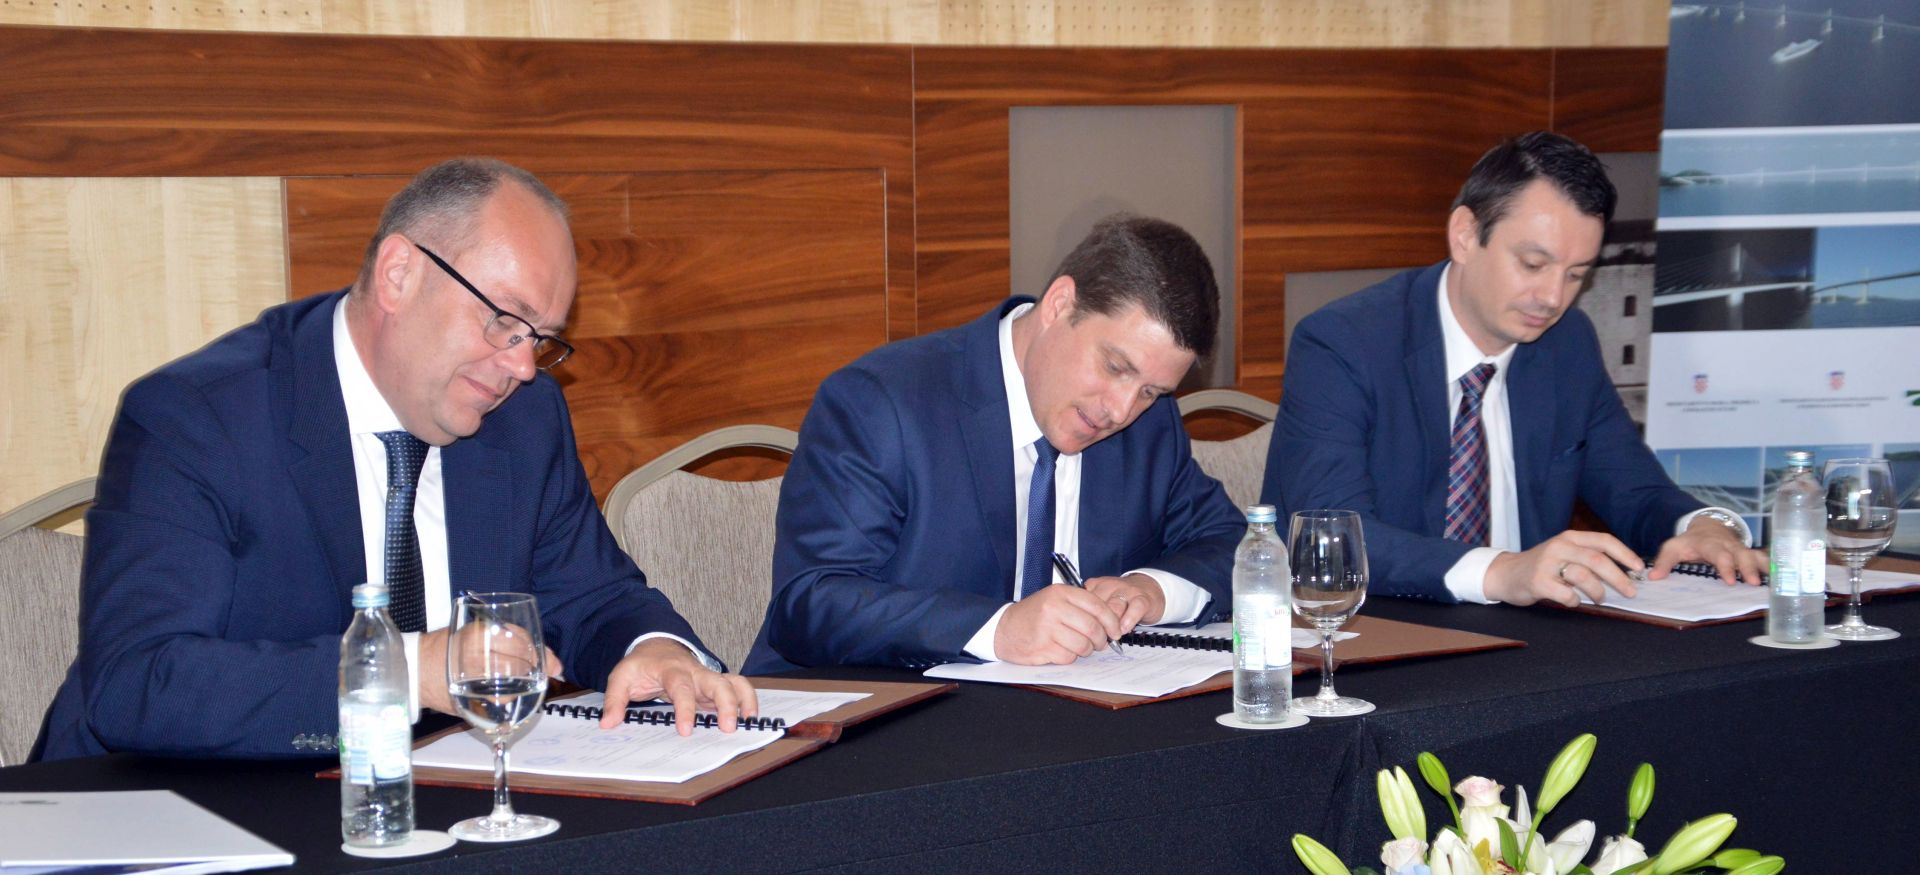 Ugovor o dodjeli bespovratnih sredstava za Pelješki most